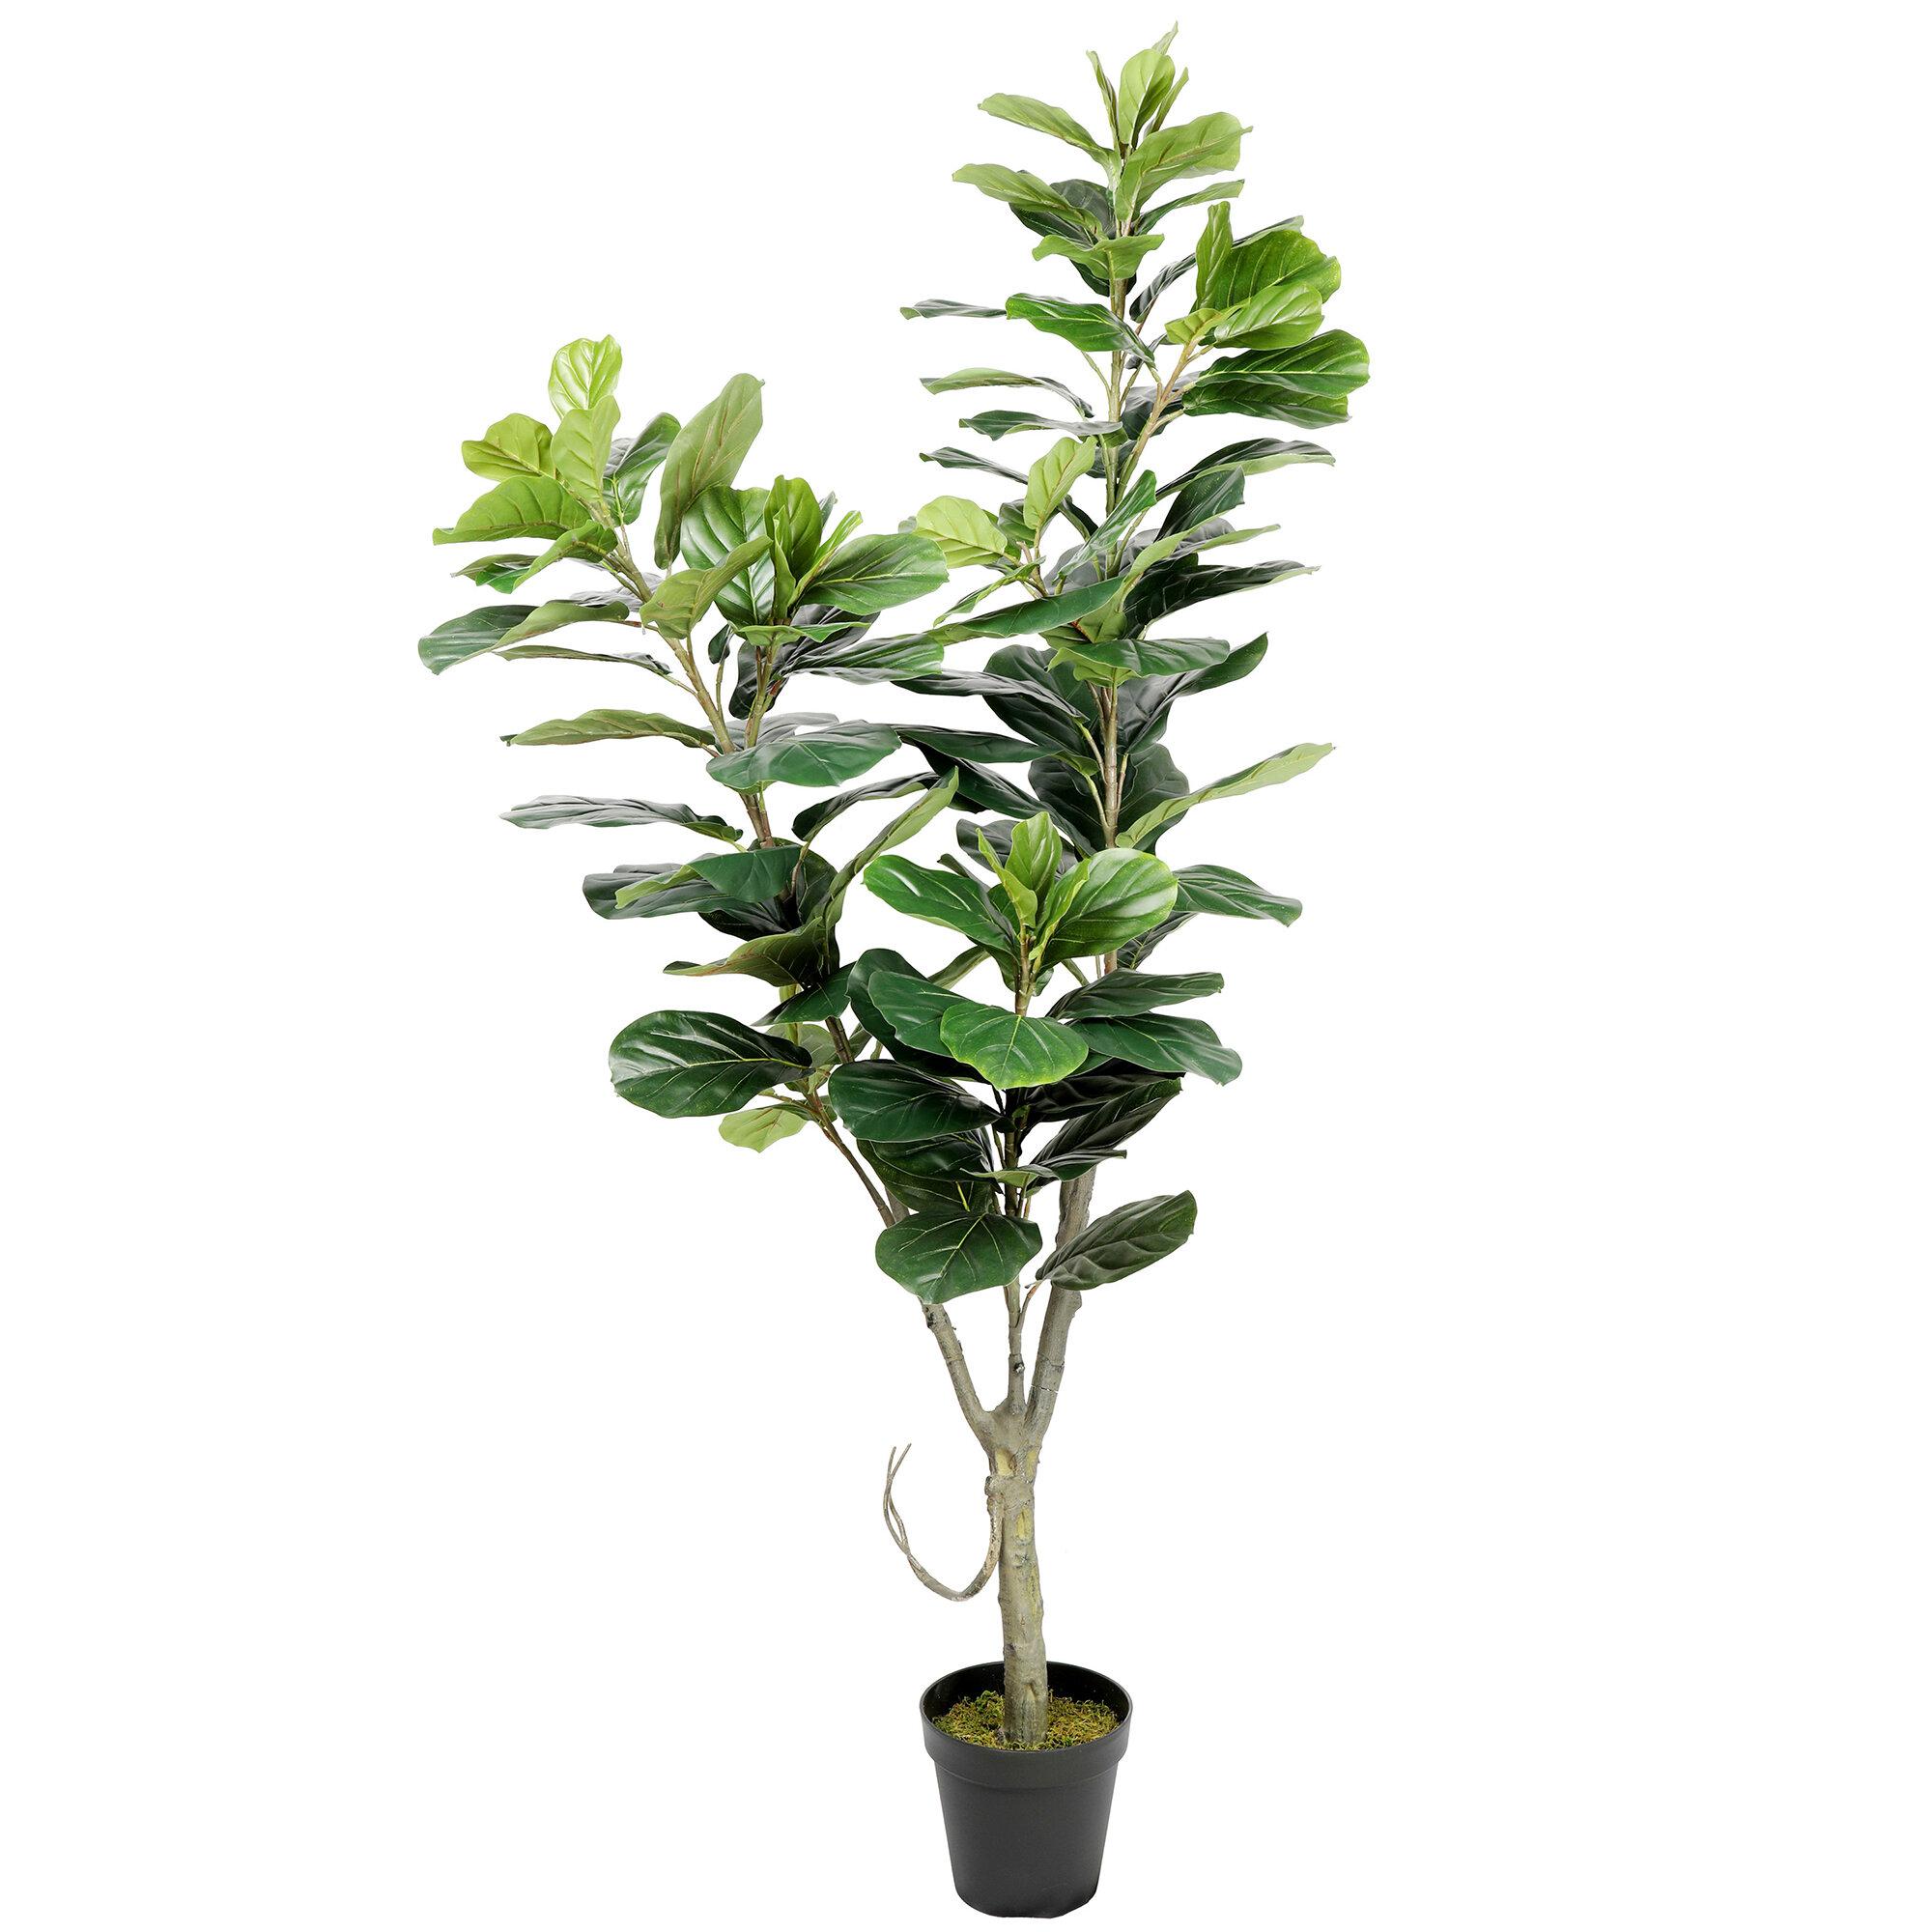 Primrue 74 Artificial Fiddle Leaf Fig Tree In Pot Reviews Wayfair